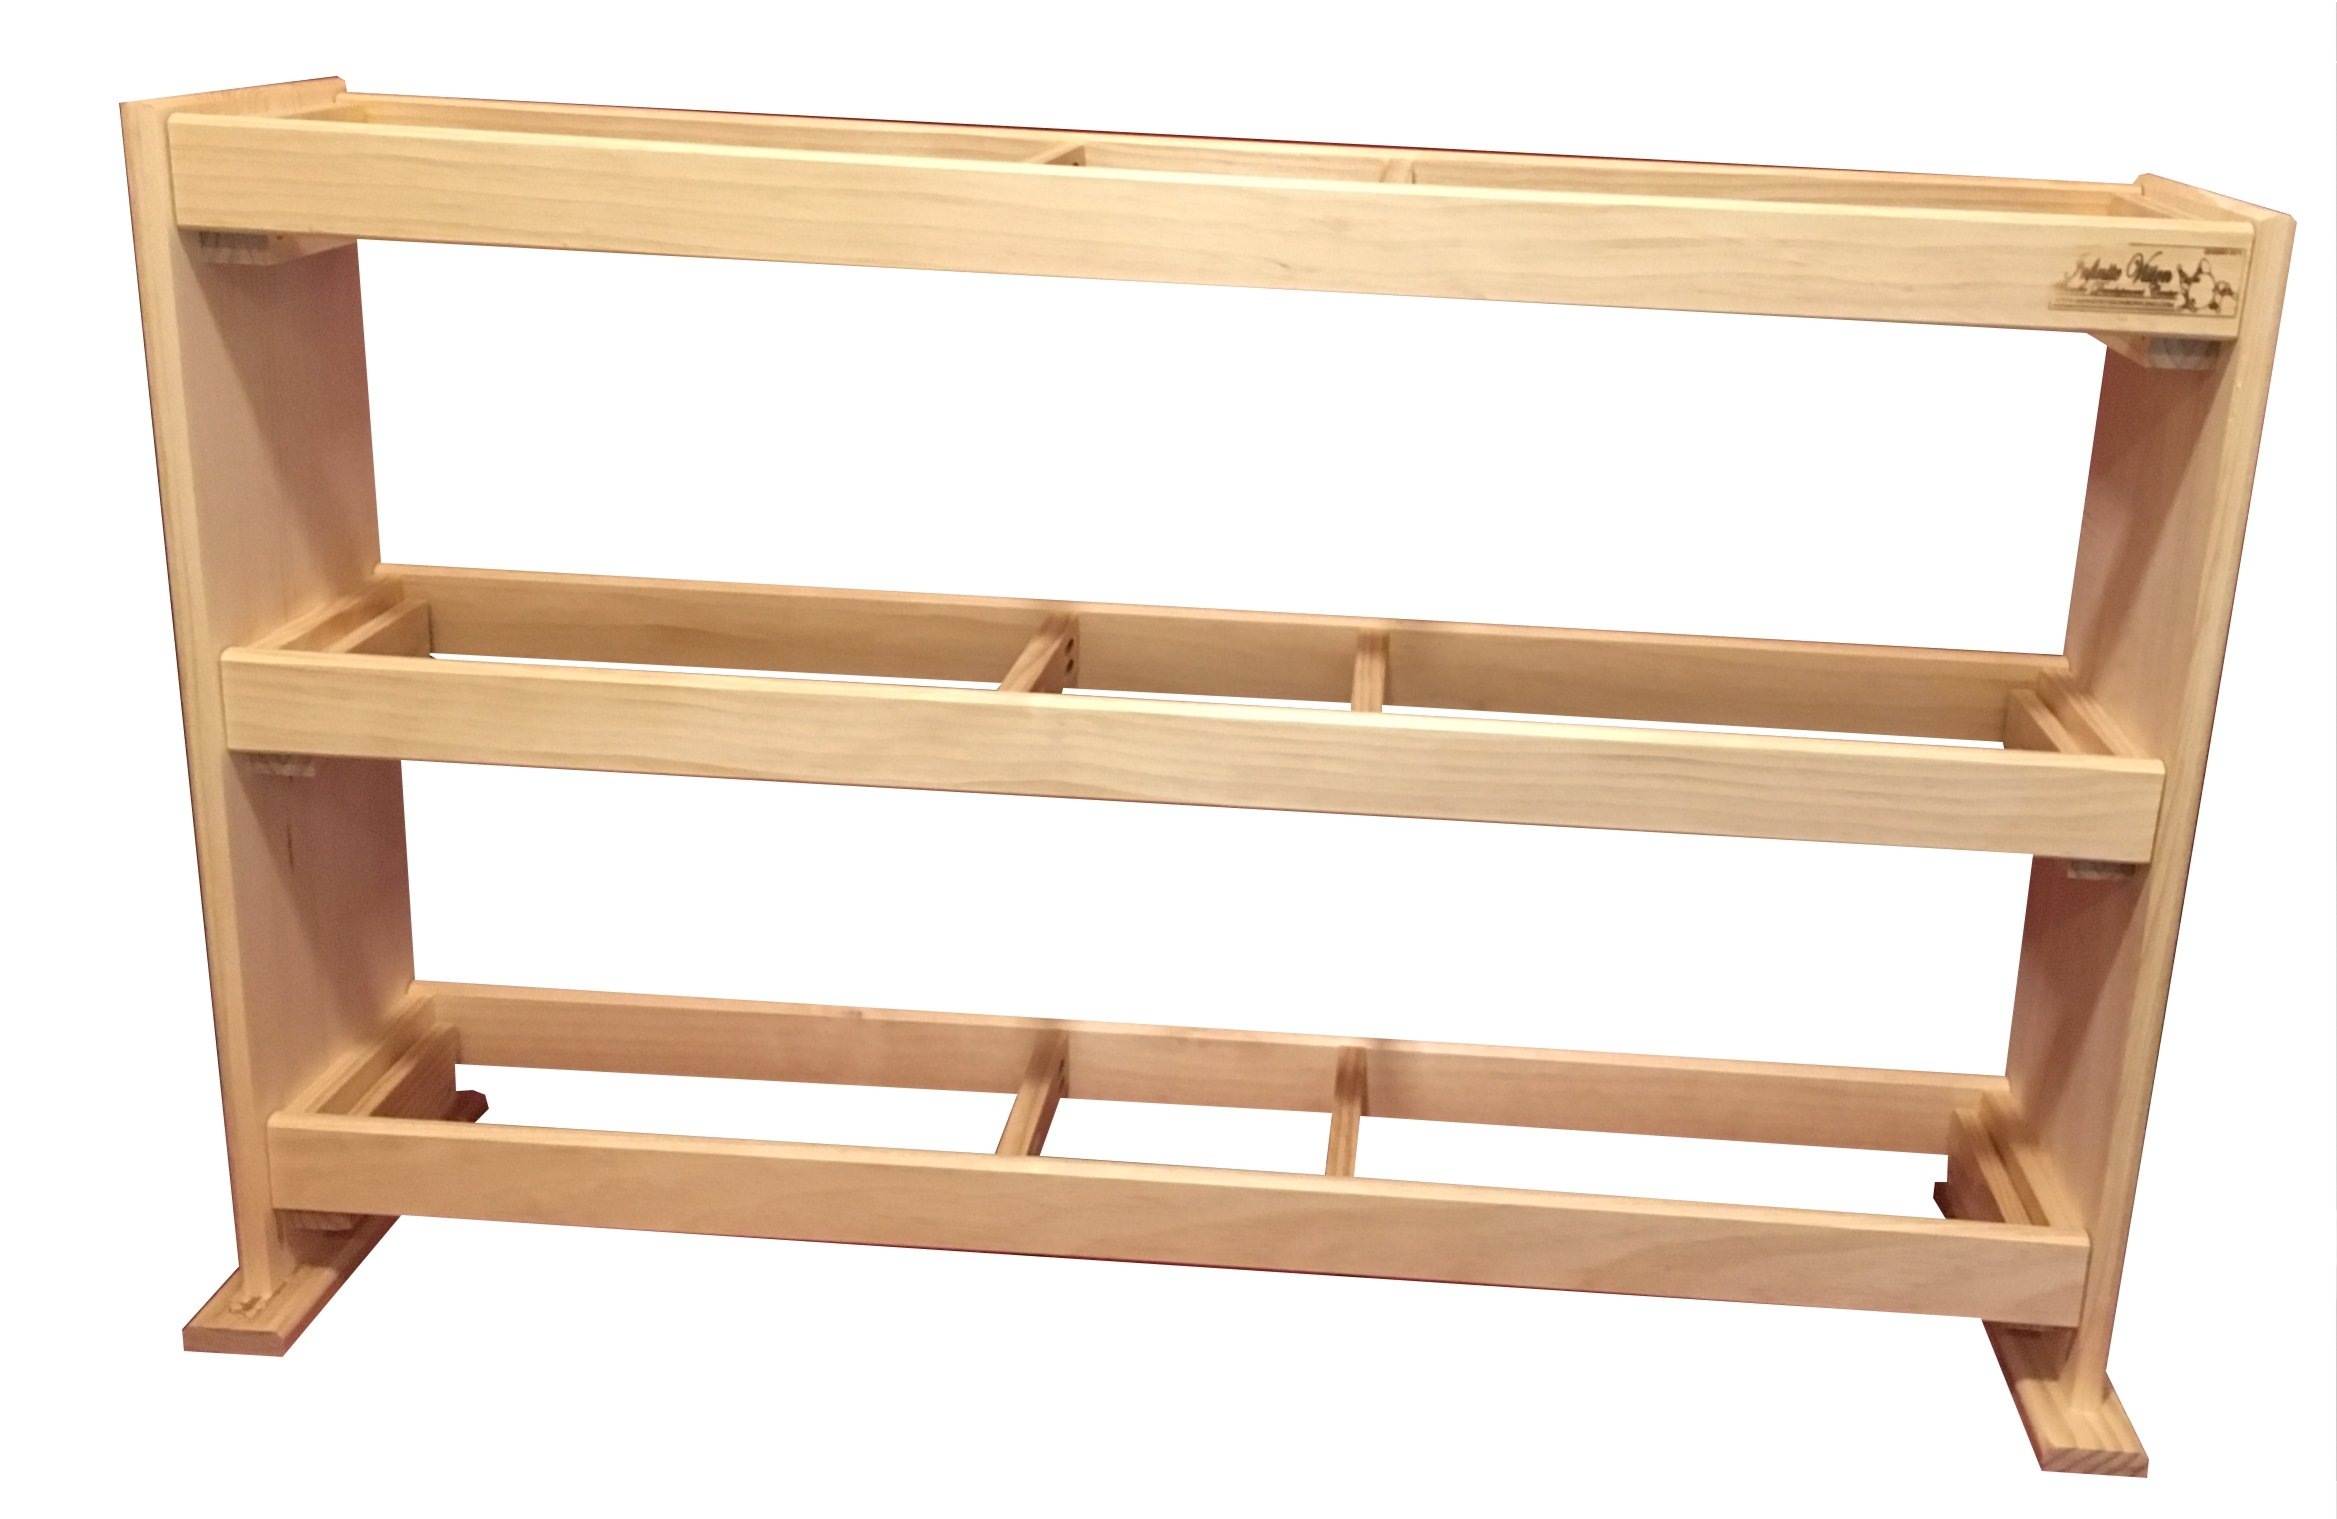 Optimal Branding Solutions Bowling Ball Rack - Wood - (15 Ball Capacity)